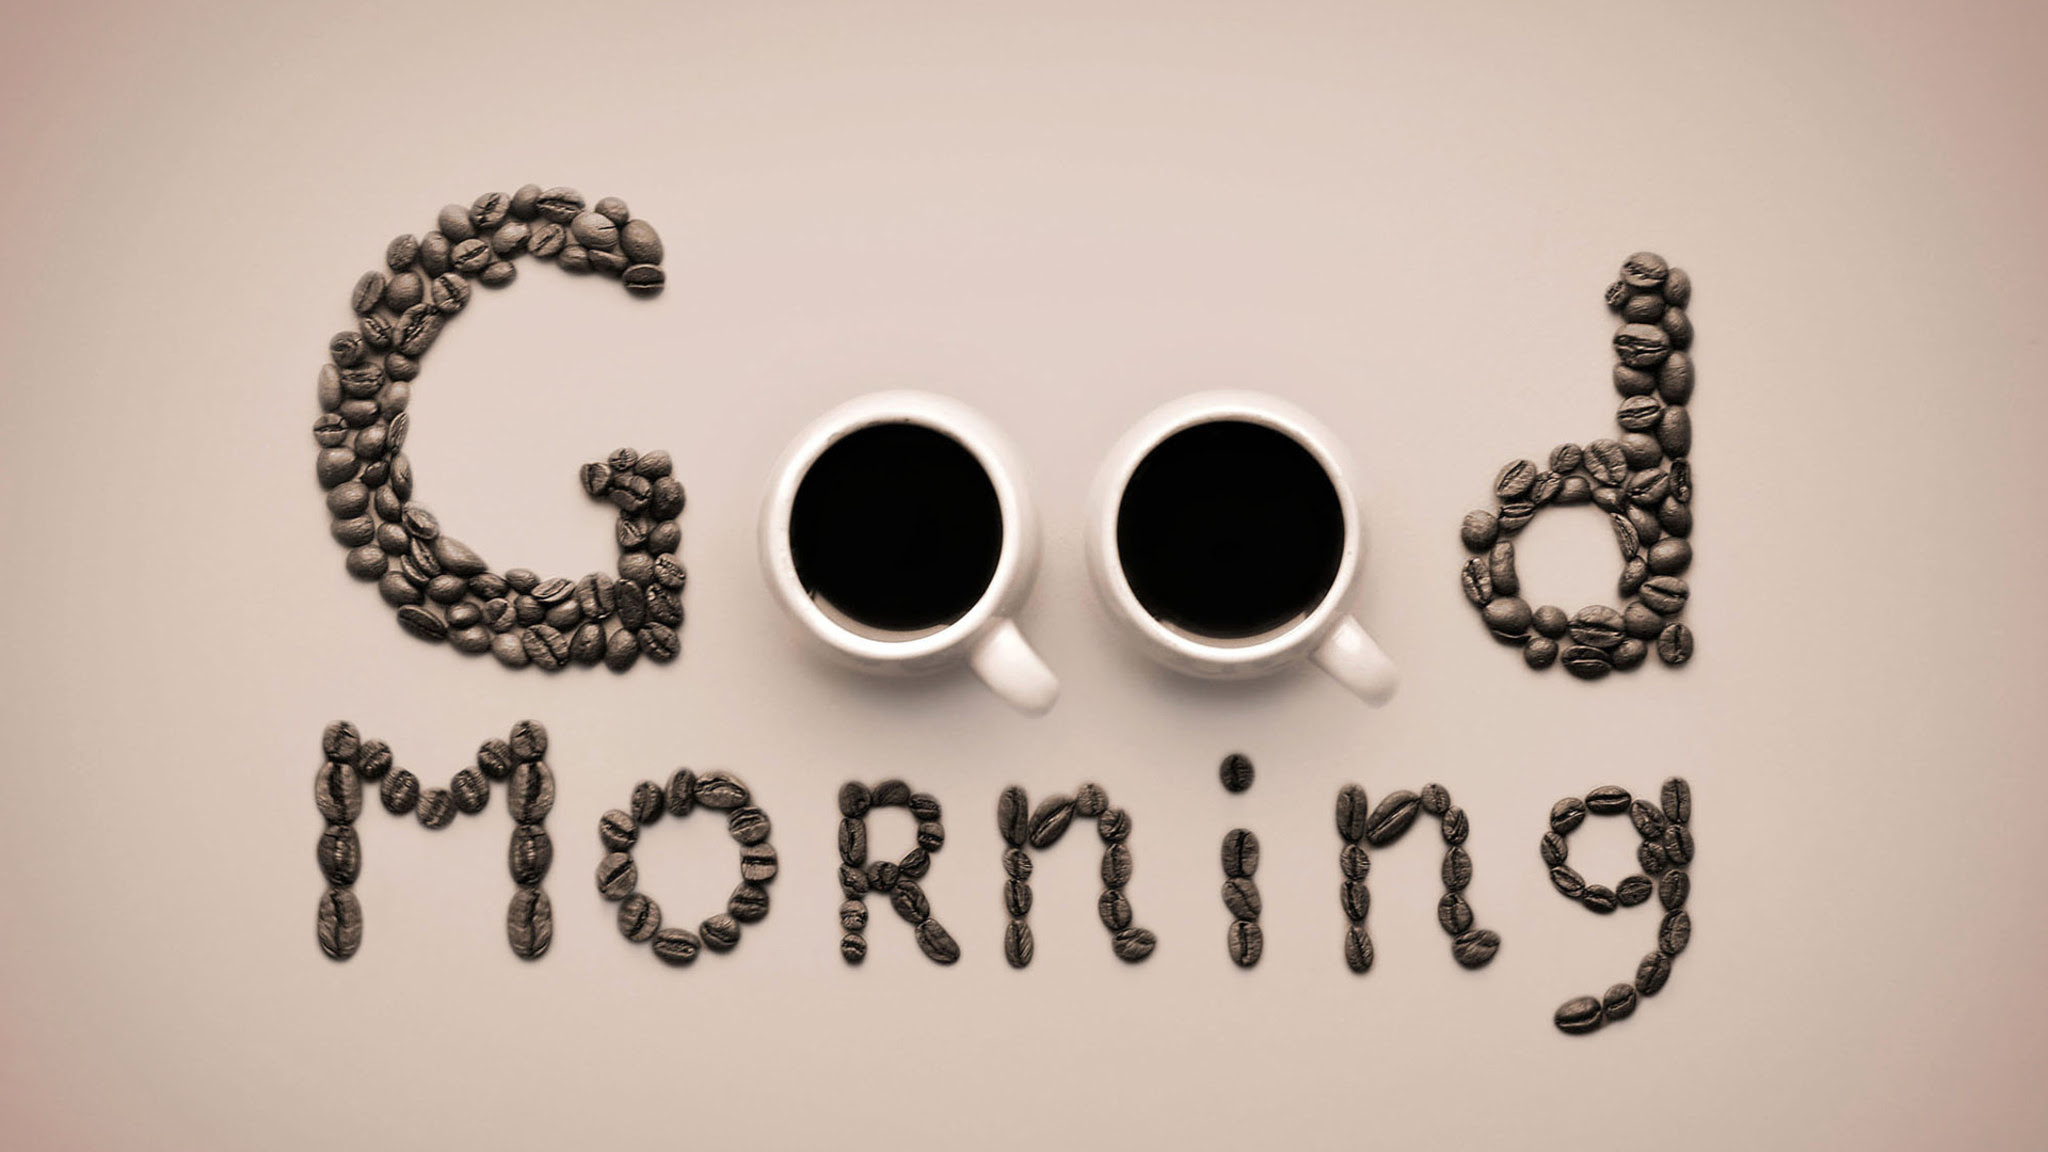 2048x1152 Good Morning Coffee 2048x1152 Resolution Hd 4k Wallpapers